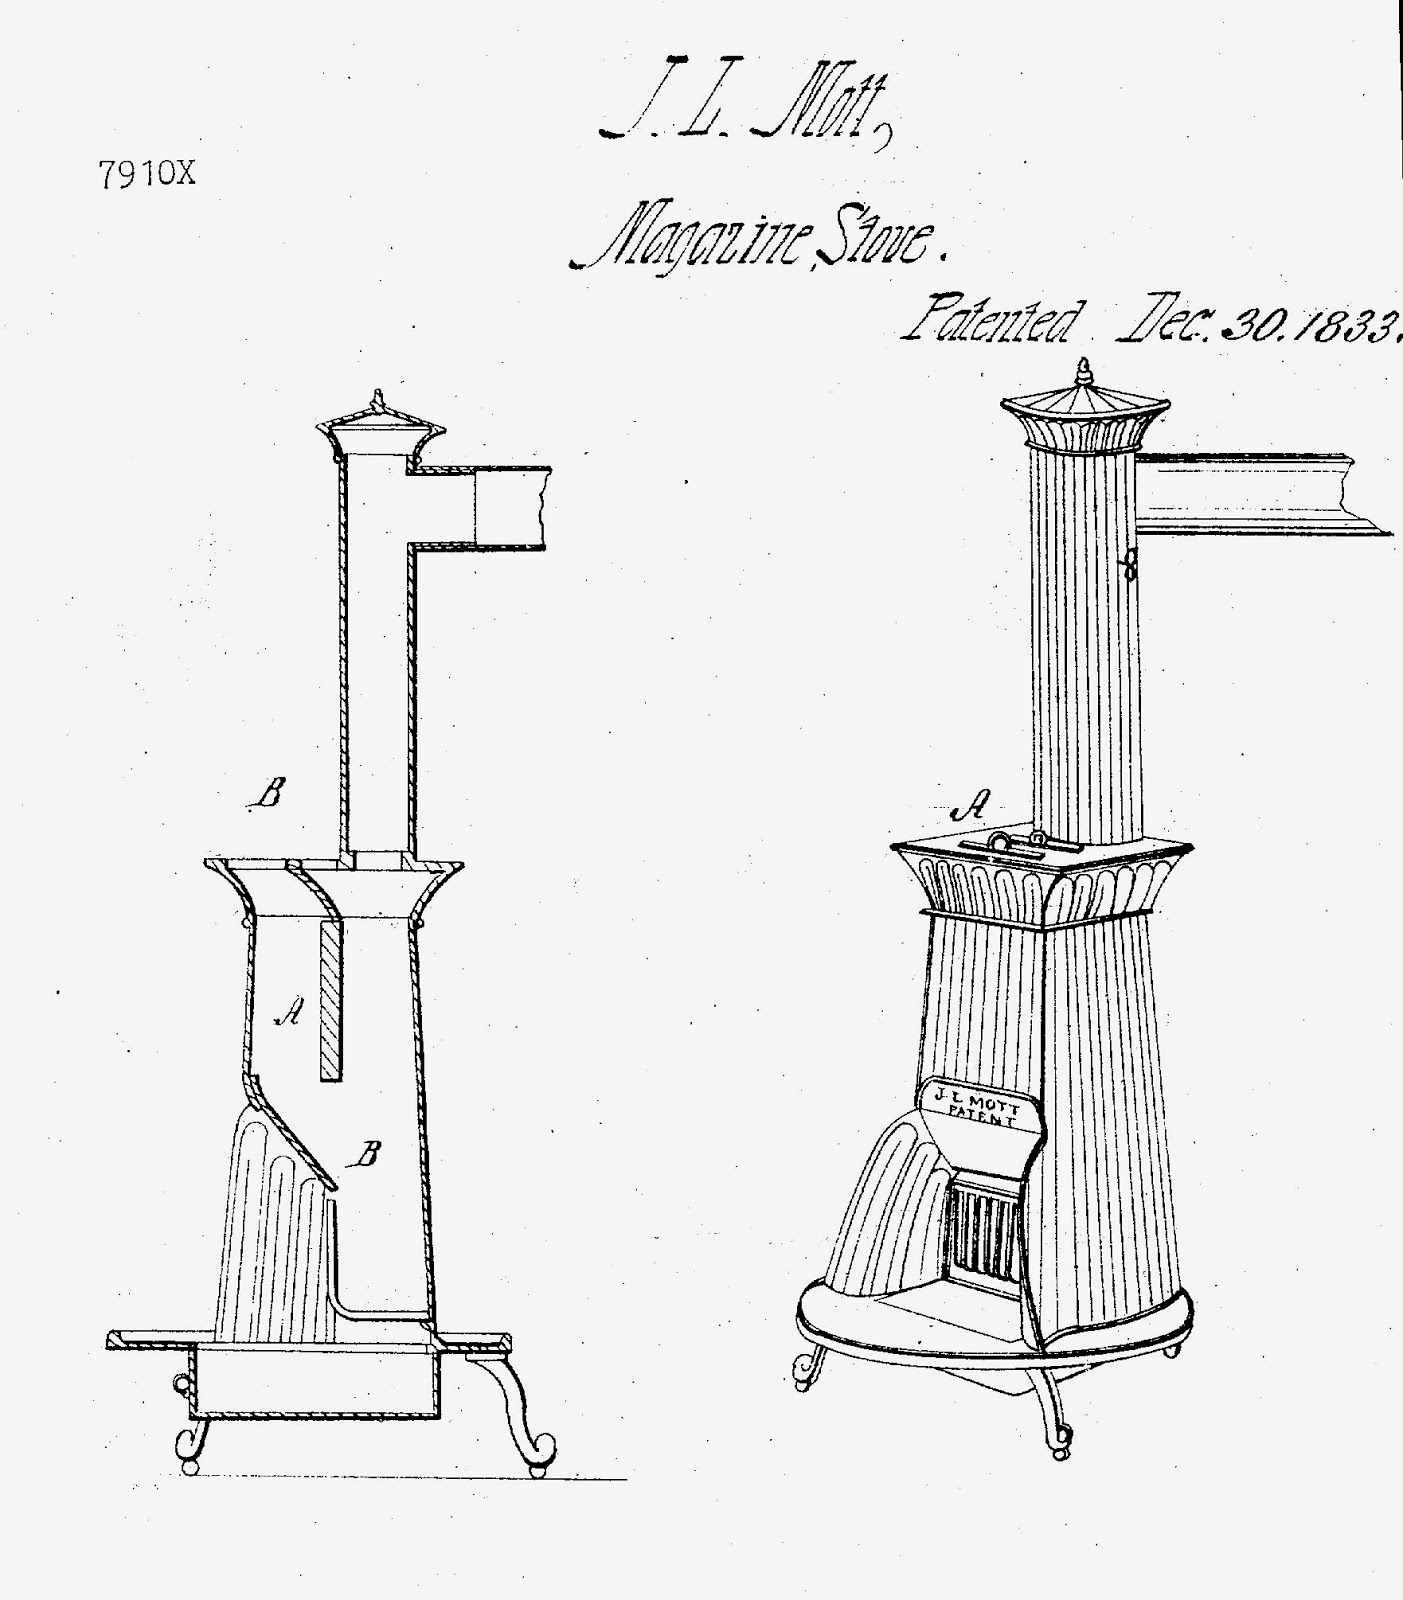 A Stove Less Ordinary: Jordan Mott's Anthracite Stoves